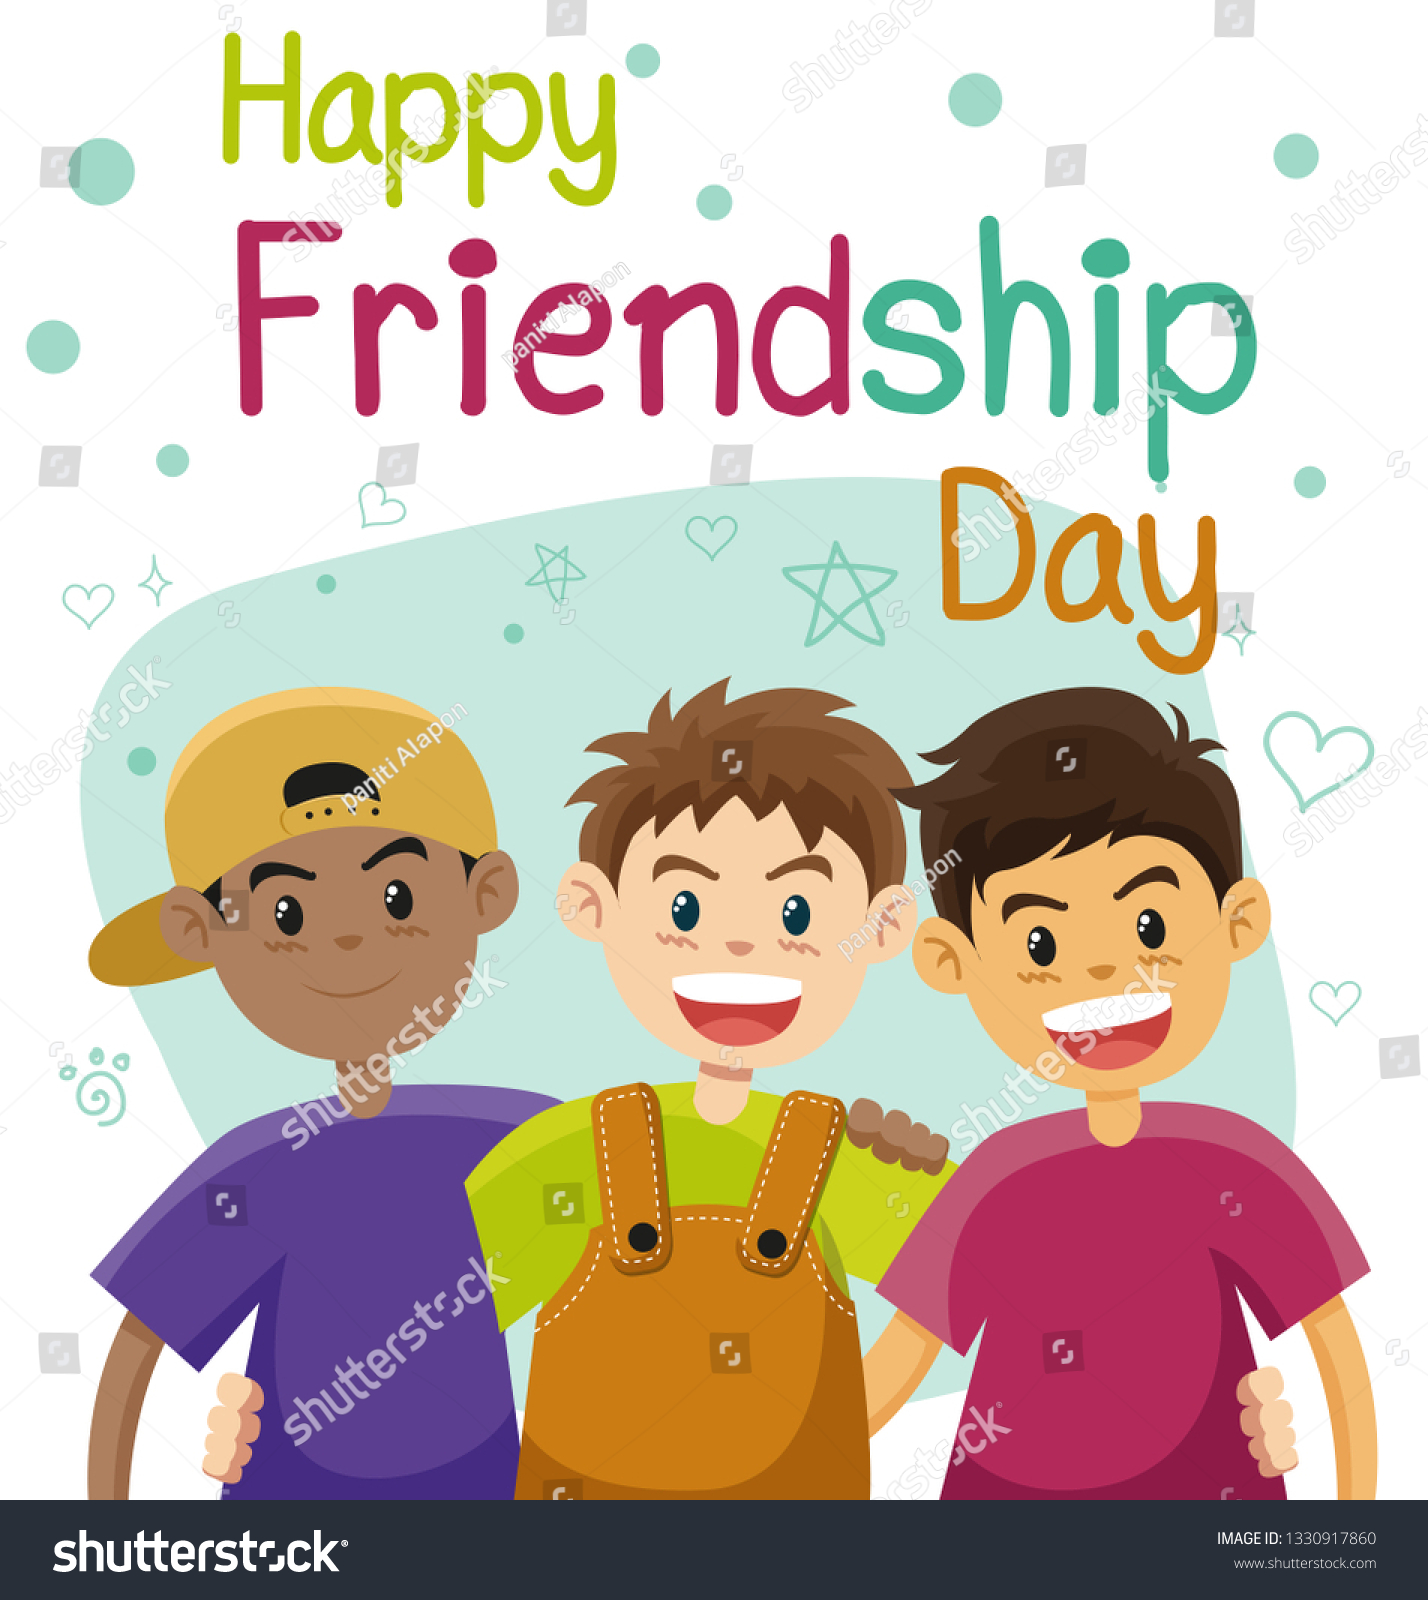 Children Three Best Friends Friendship Flat Stock Vector Royalty Free 1330917860